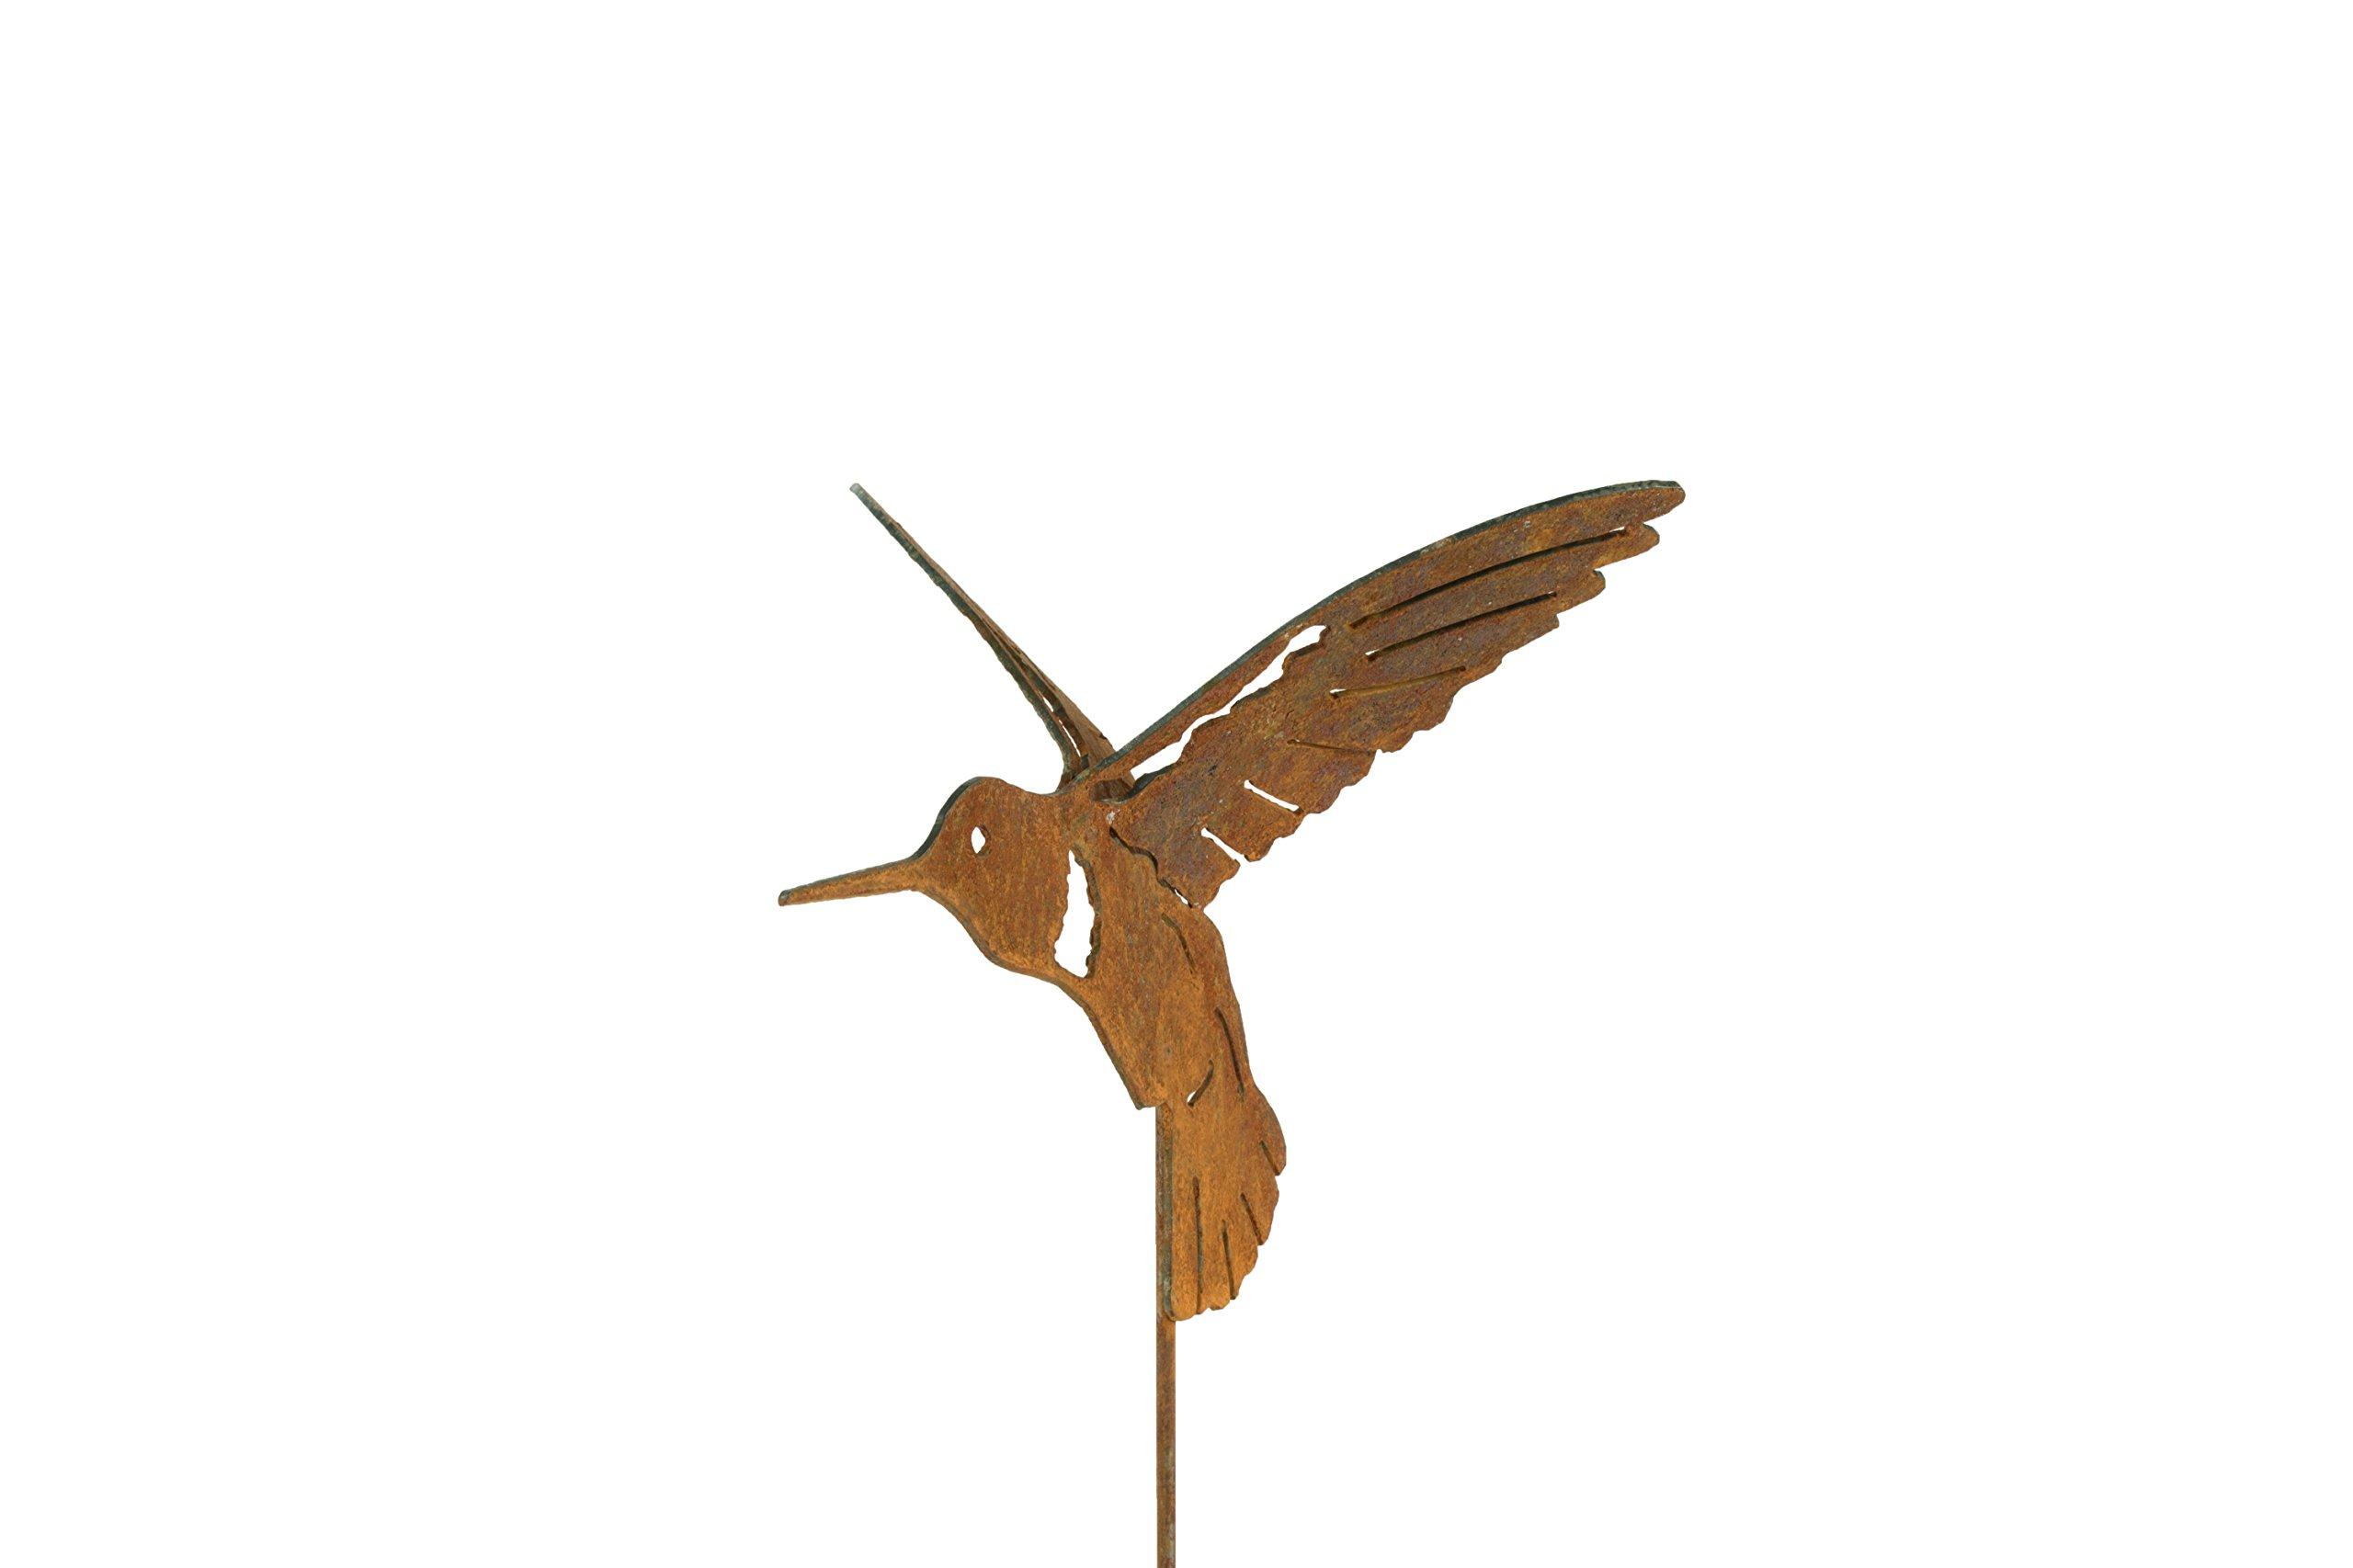 BLUE LUCA Hummingbird Garden Stake | Double Wing Hummingbird Art for The Yard | Made in USA